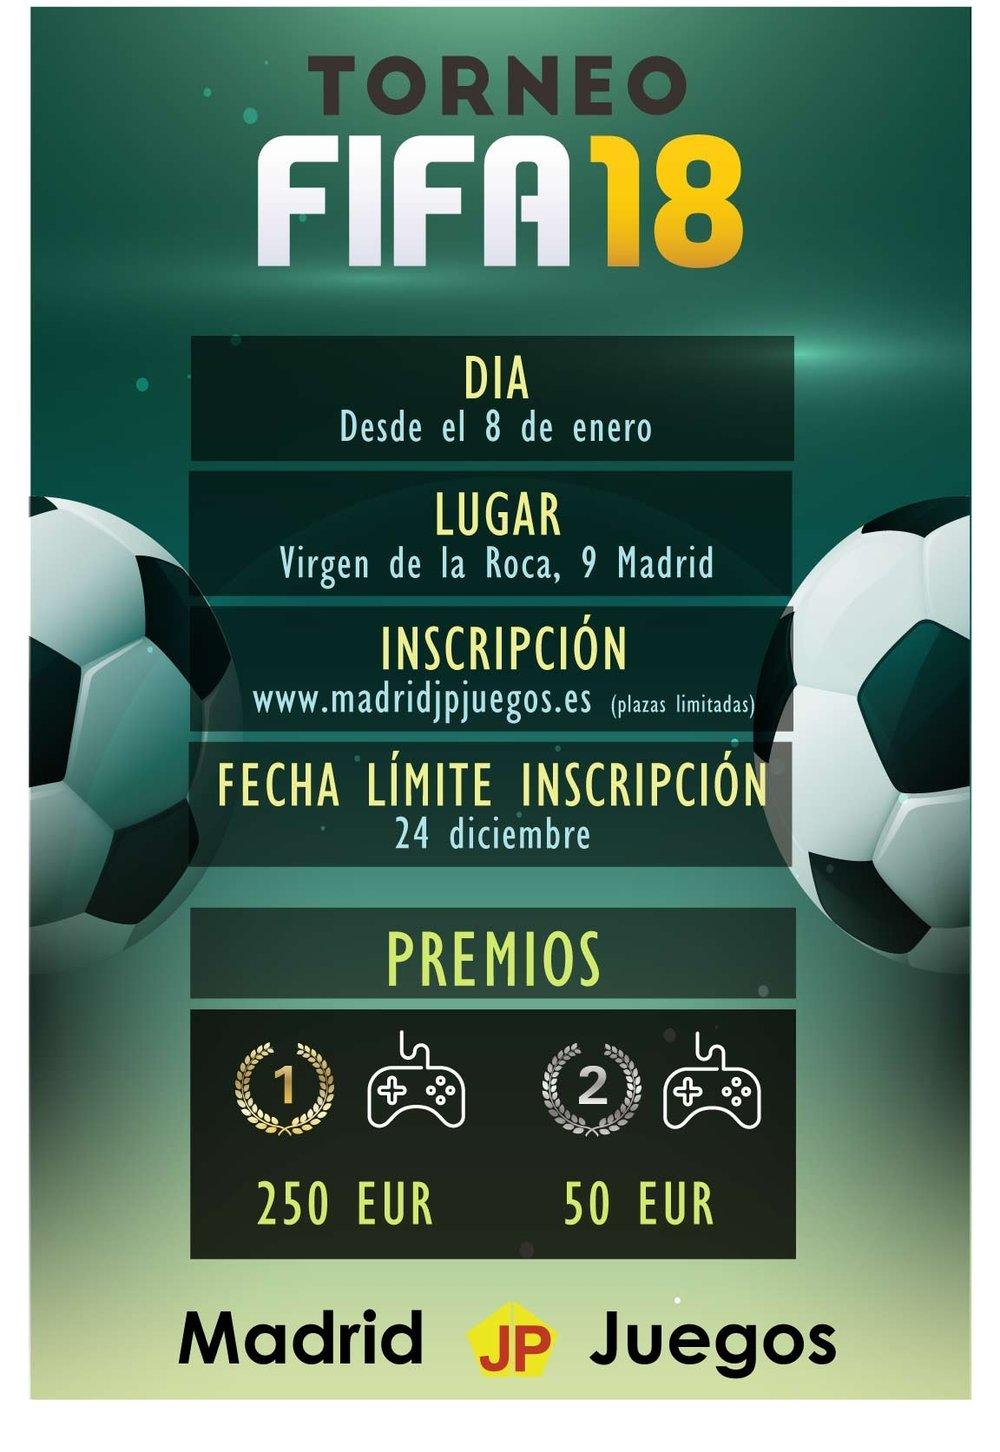 cartel-FIFA18-ene18.jpg